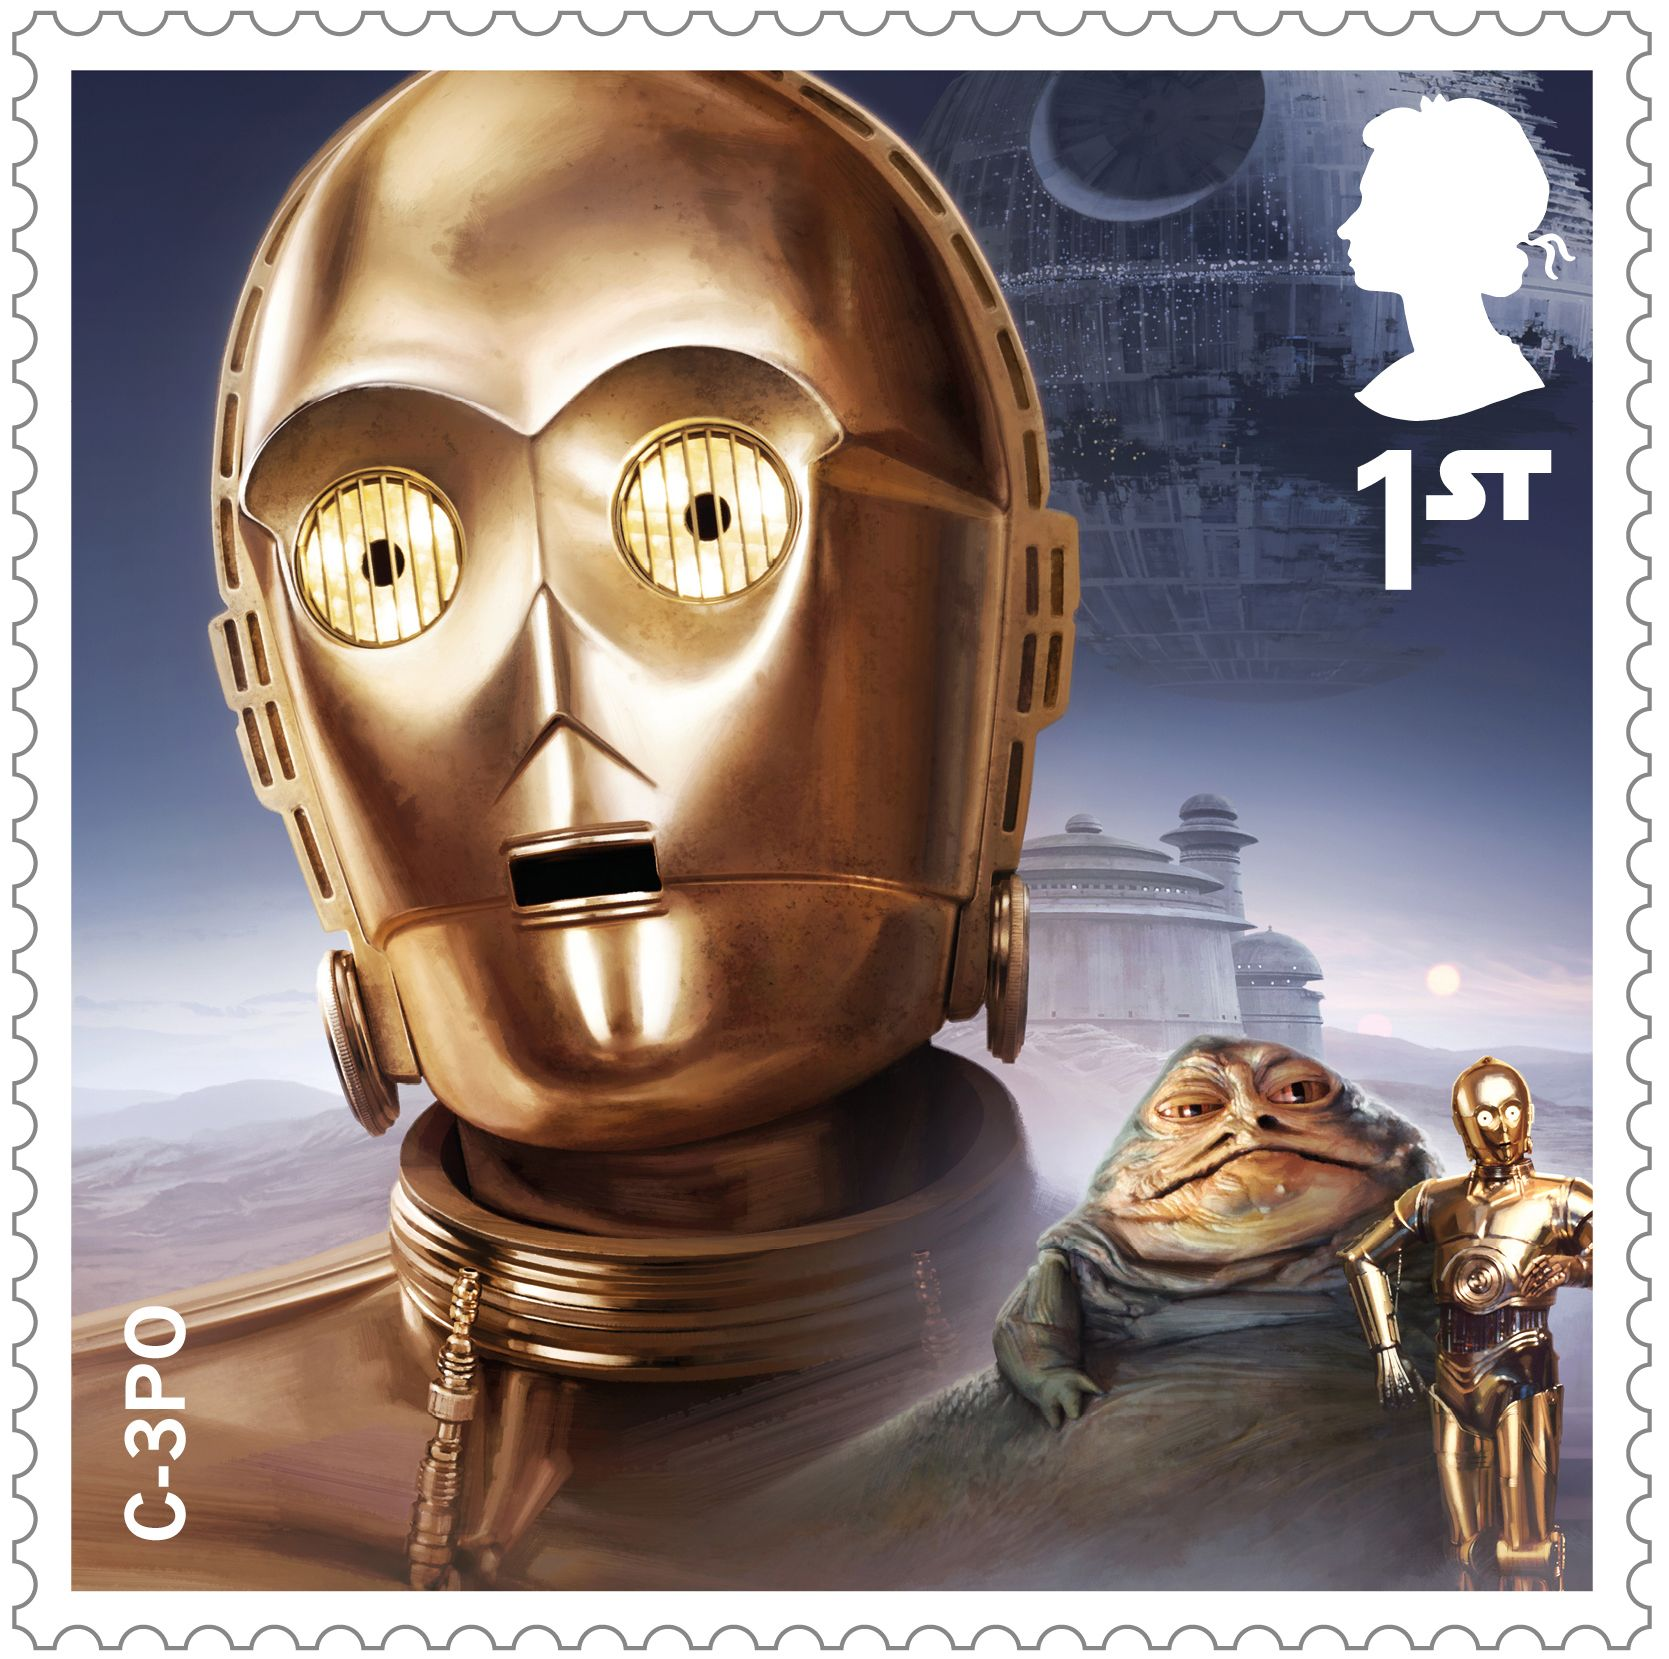 Star Wars Droids And Aliens 1st Stamp 2017 C 3po Filme